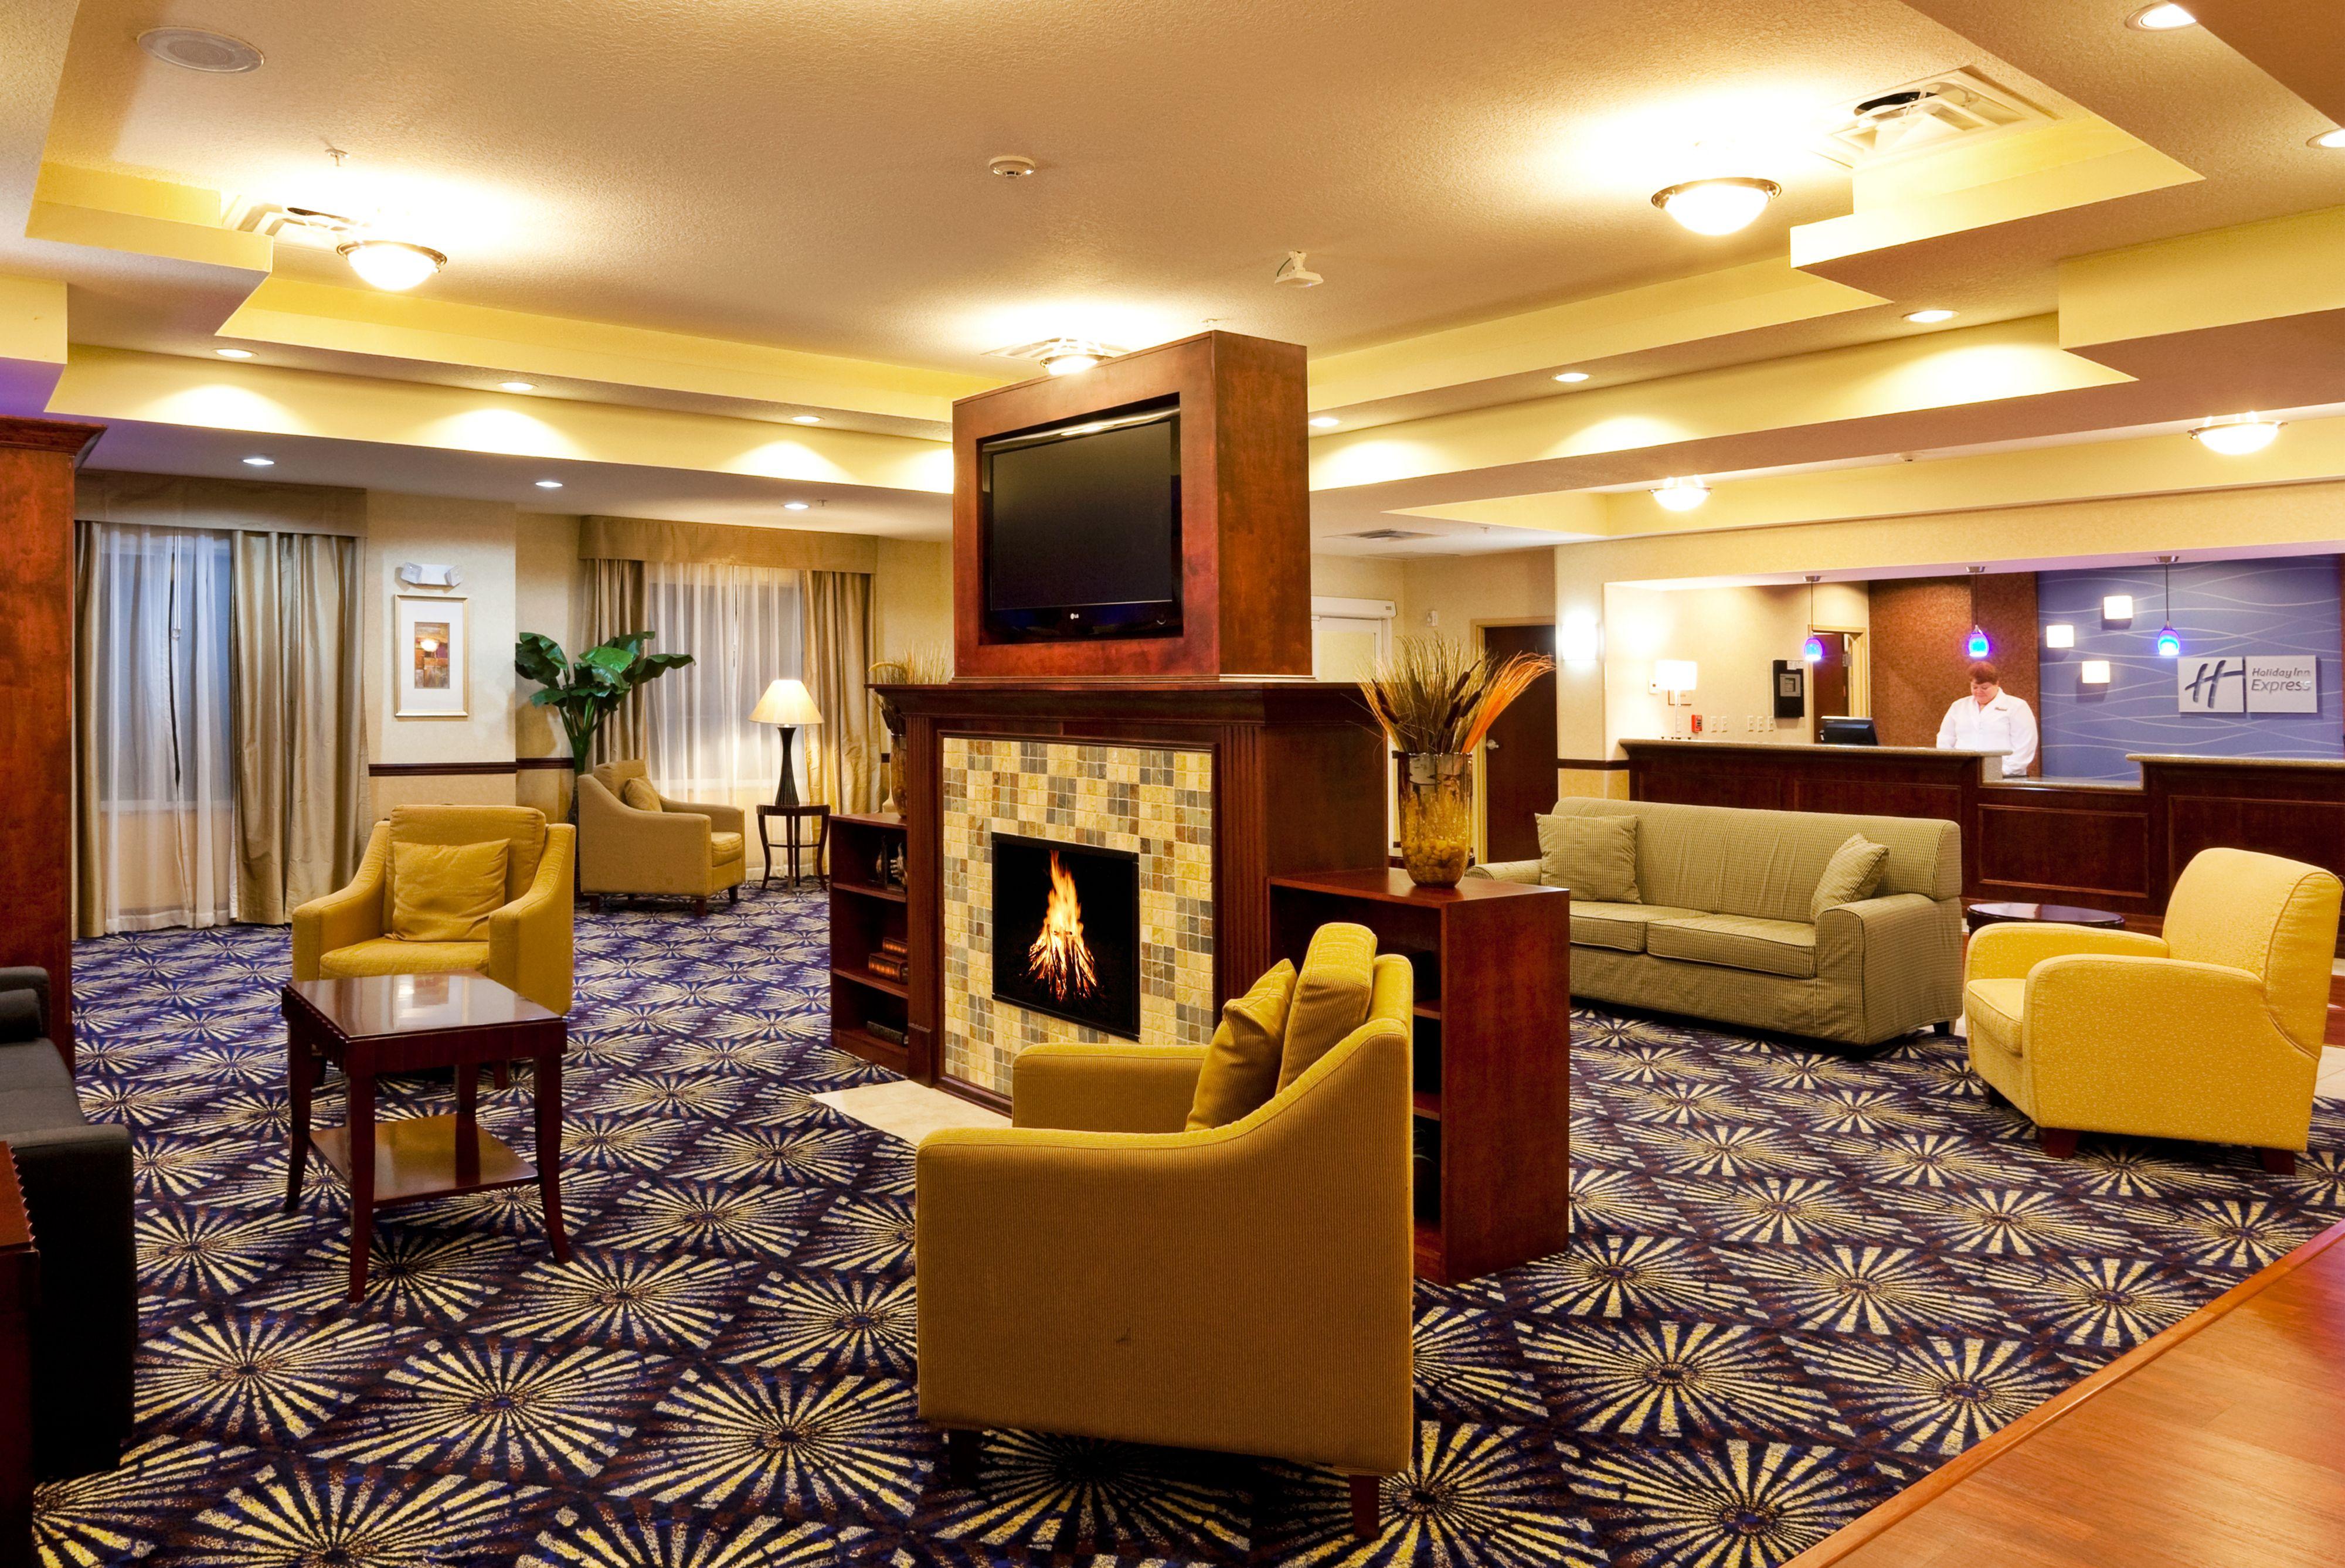 Holiday Inn Express & Suites Brooksville-I-75 image 4